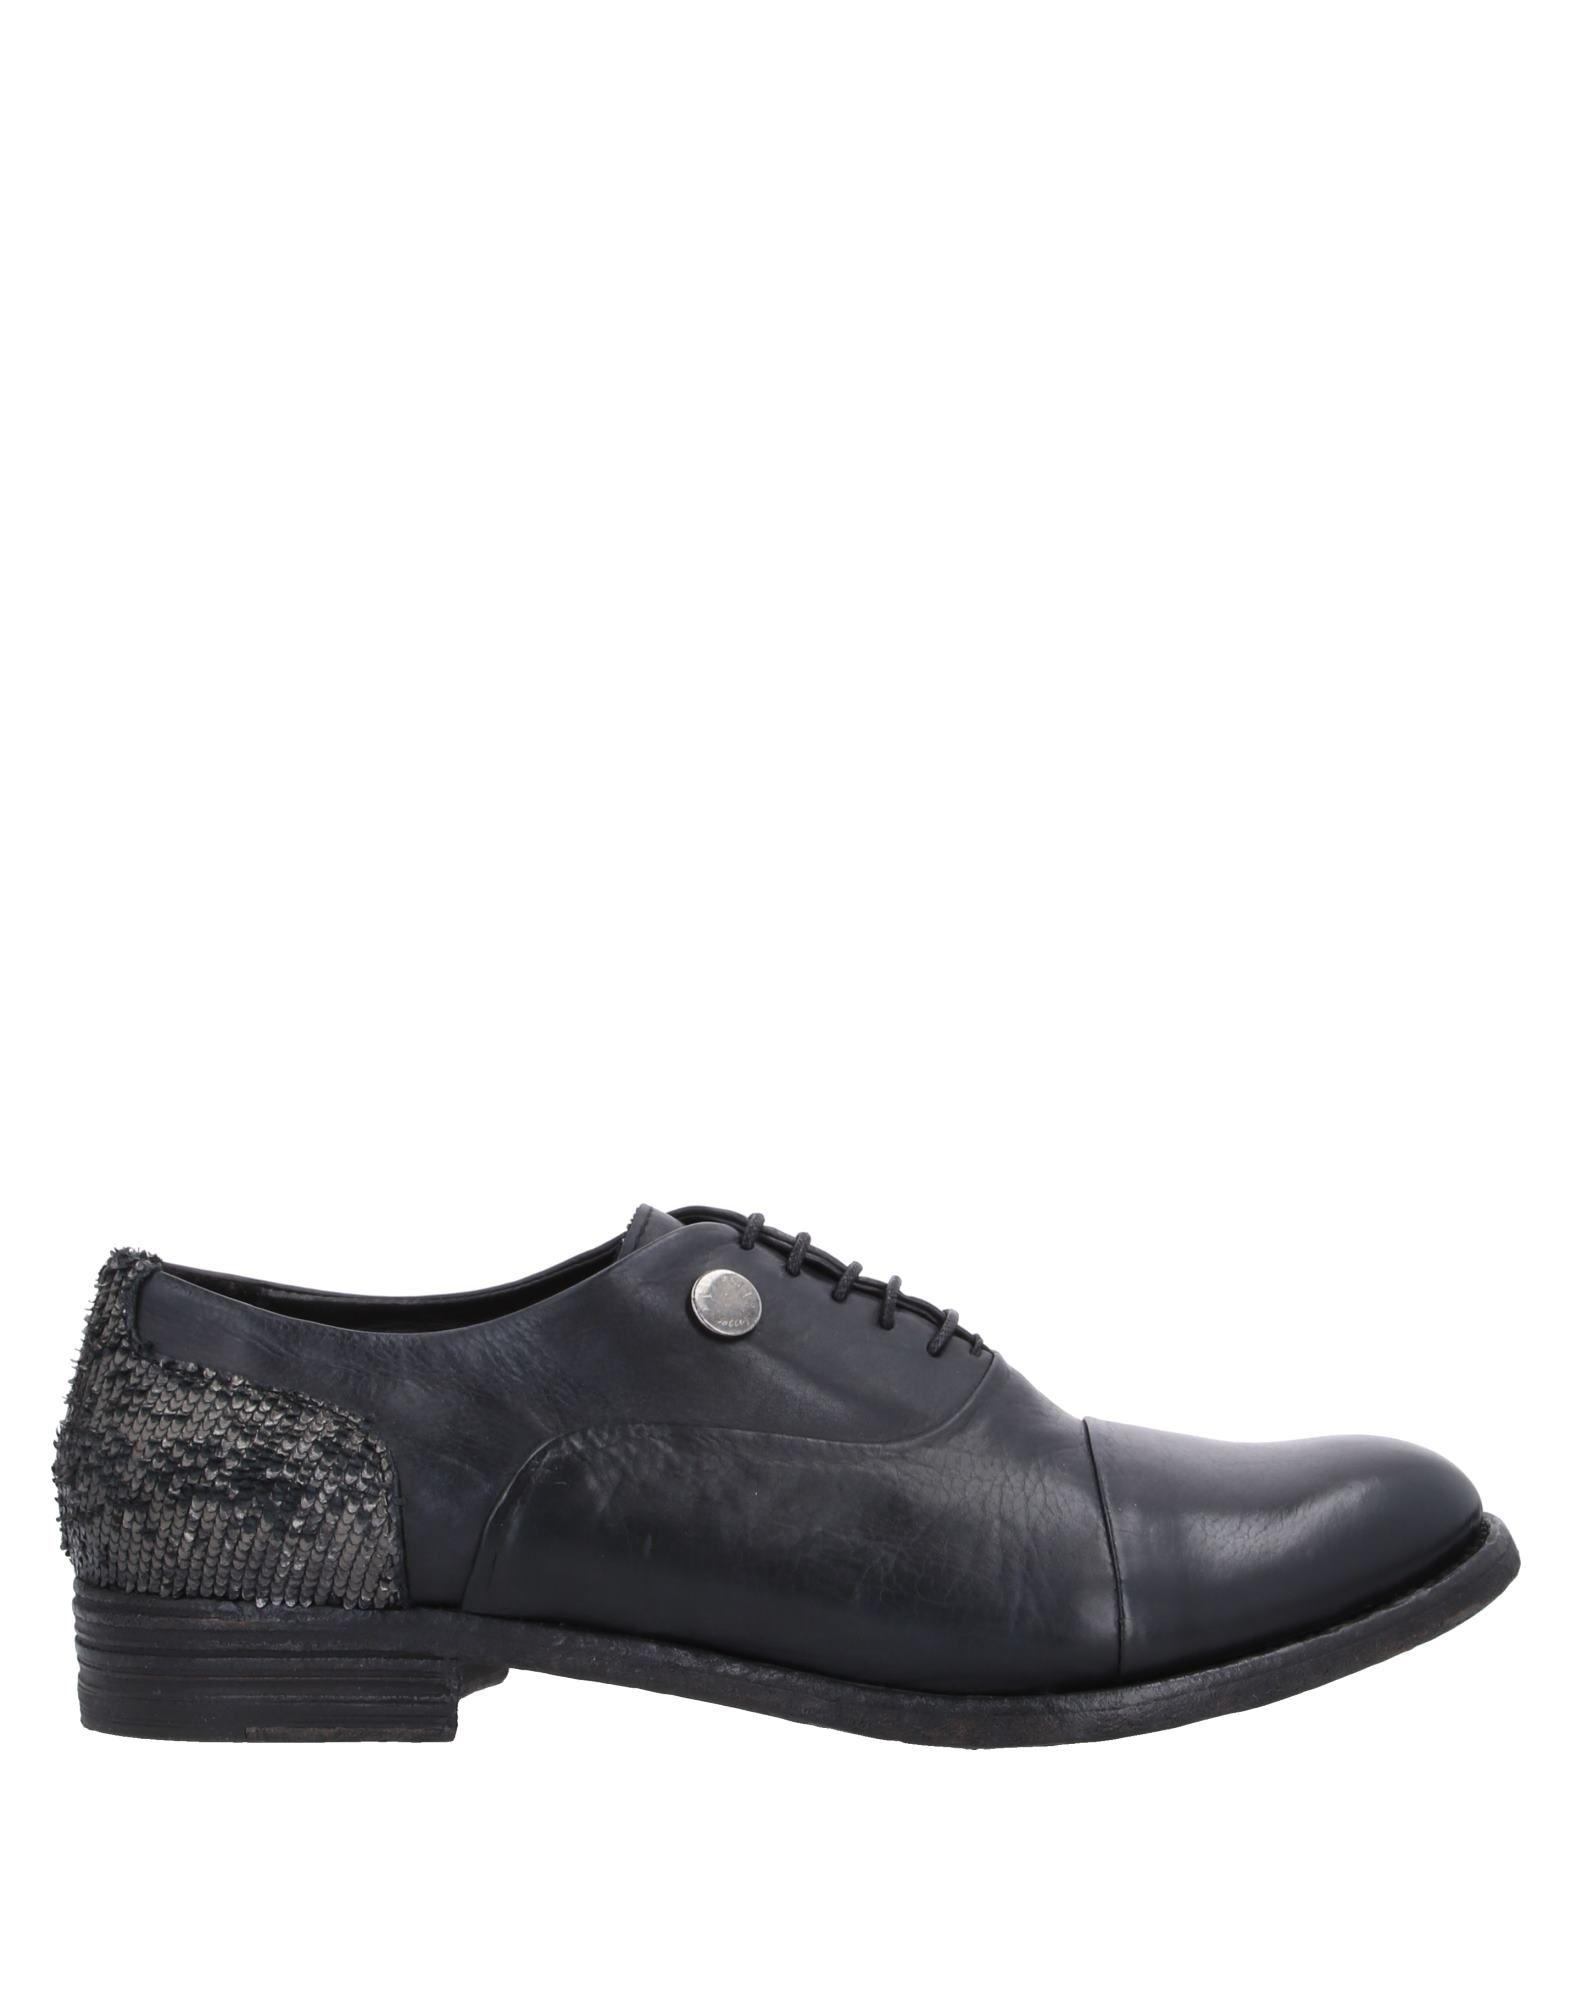 LA BOTTEGA DI LISA Обувь на шнурках